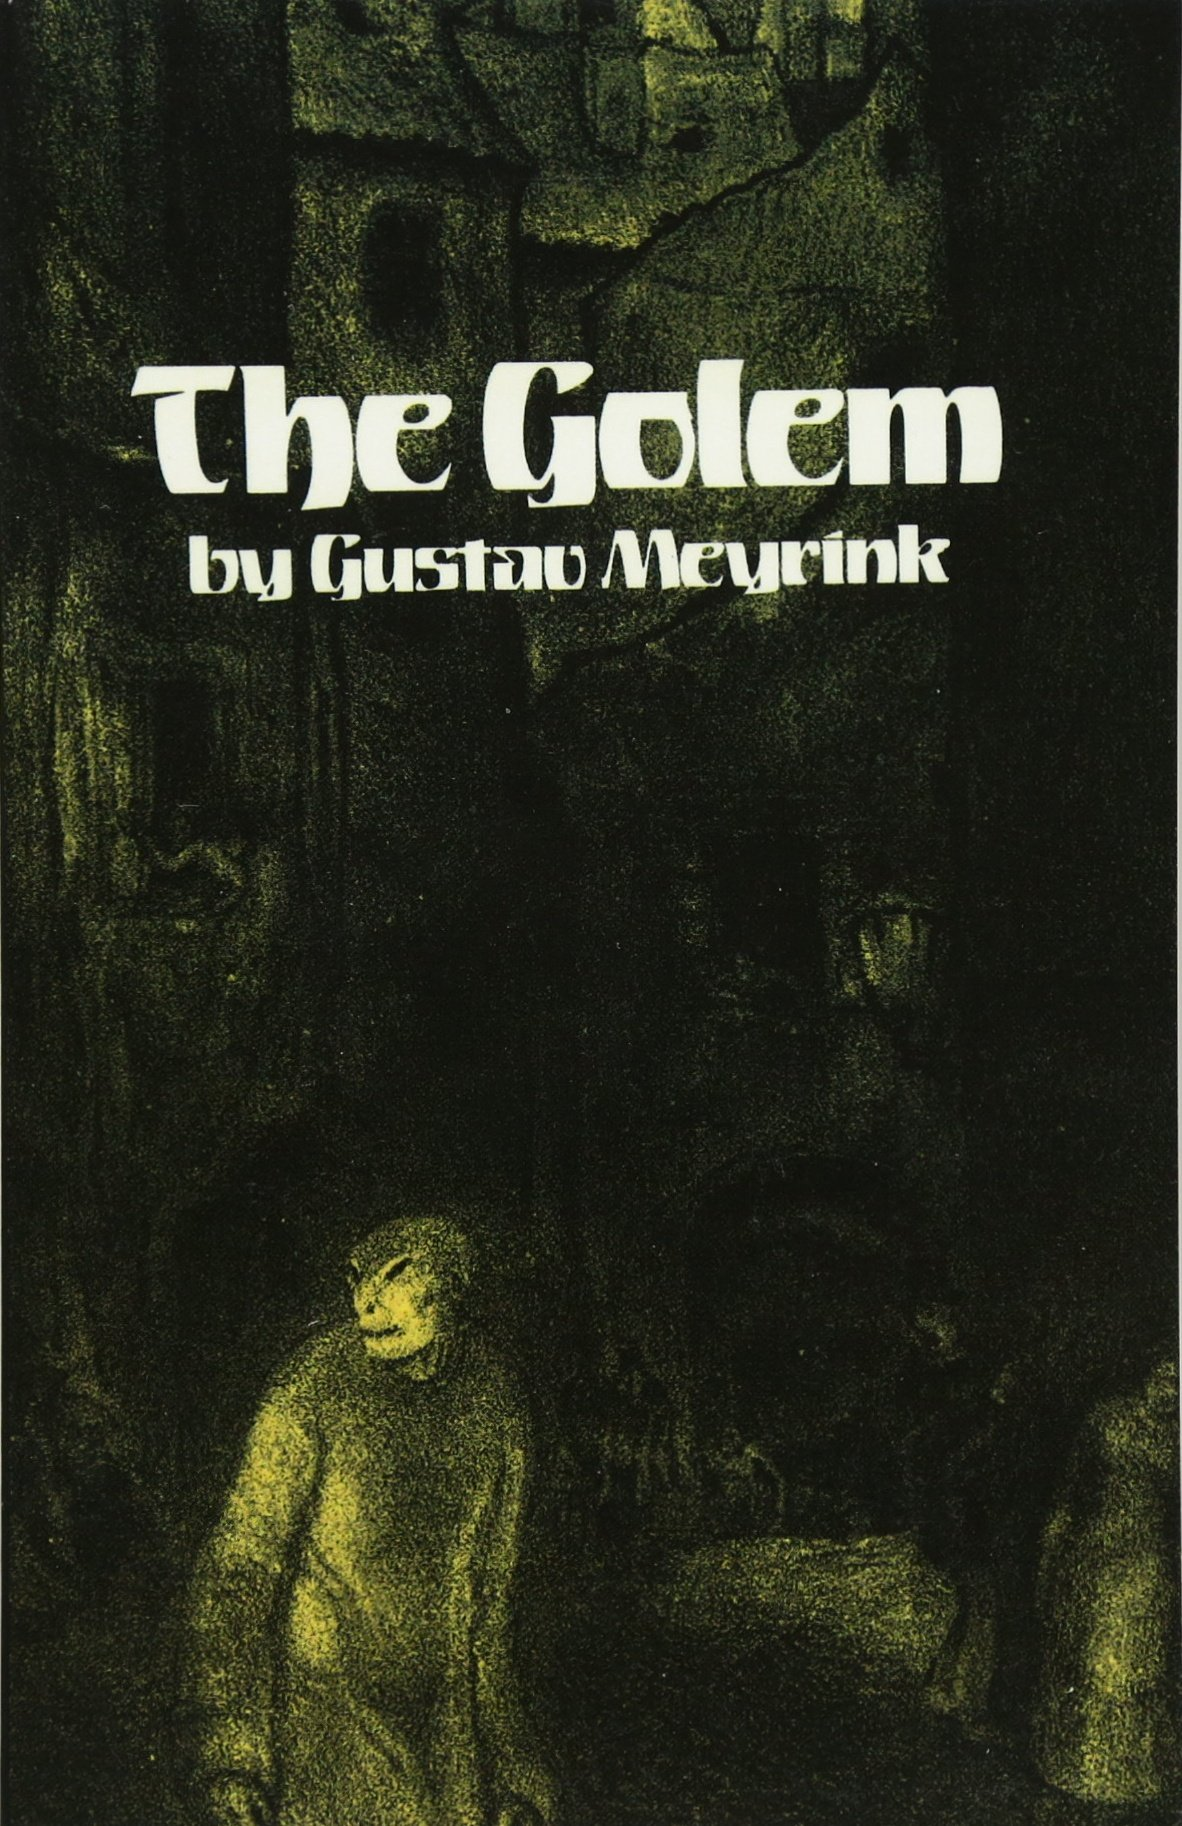 The Golem (Dover Mystery, Detective, & Other Fiction): Gustav Meyrink, Hugo  Steiner-Prag, Madge Pemberton: 0800759250257: Amazon.com: Books